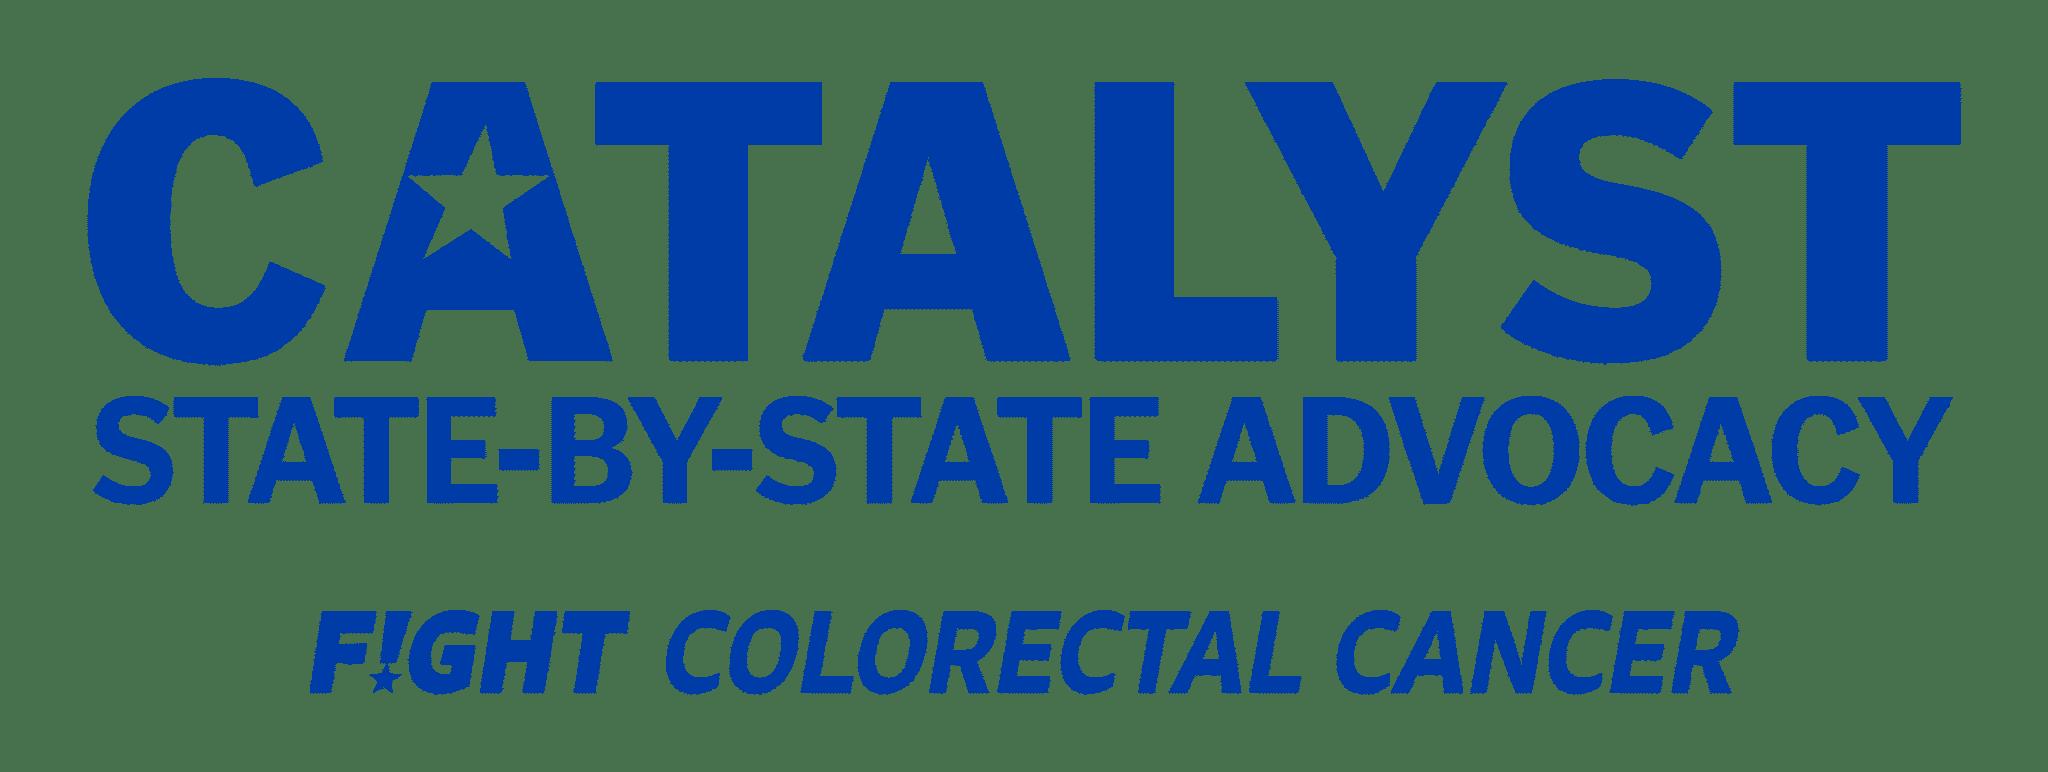 Catalyst Program Fight Colorectal Cancer